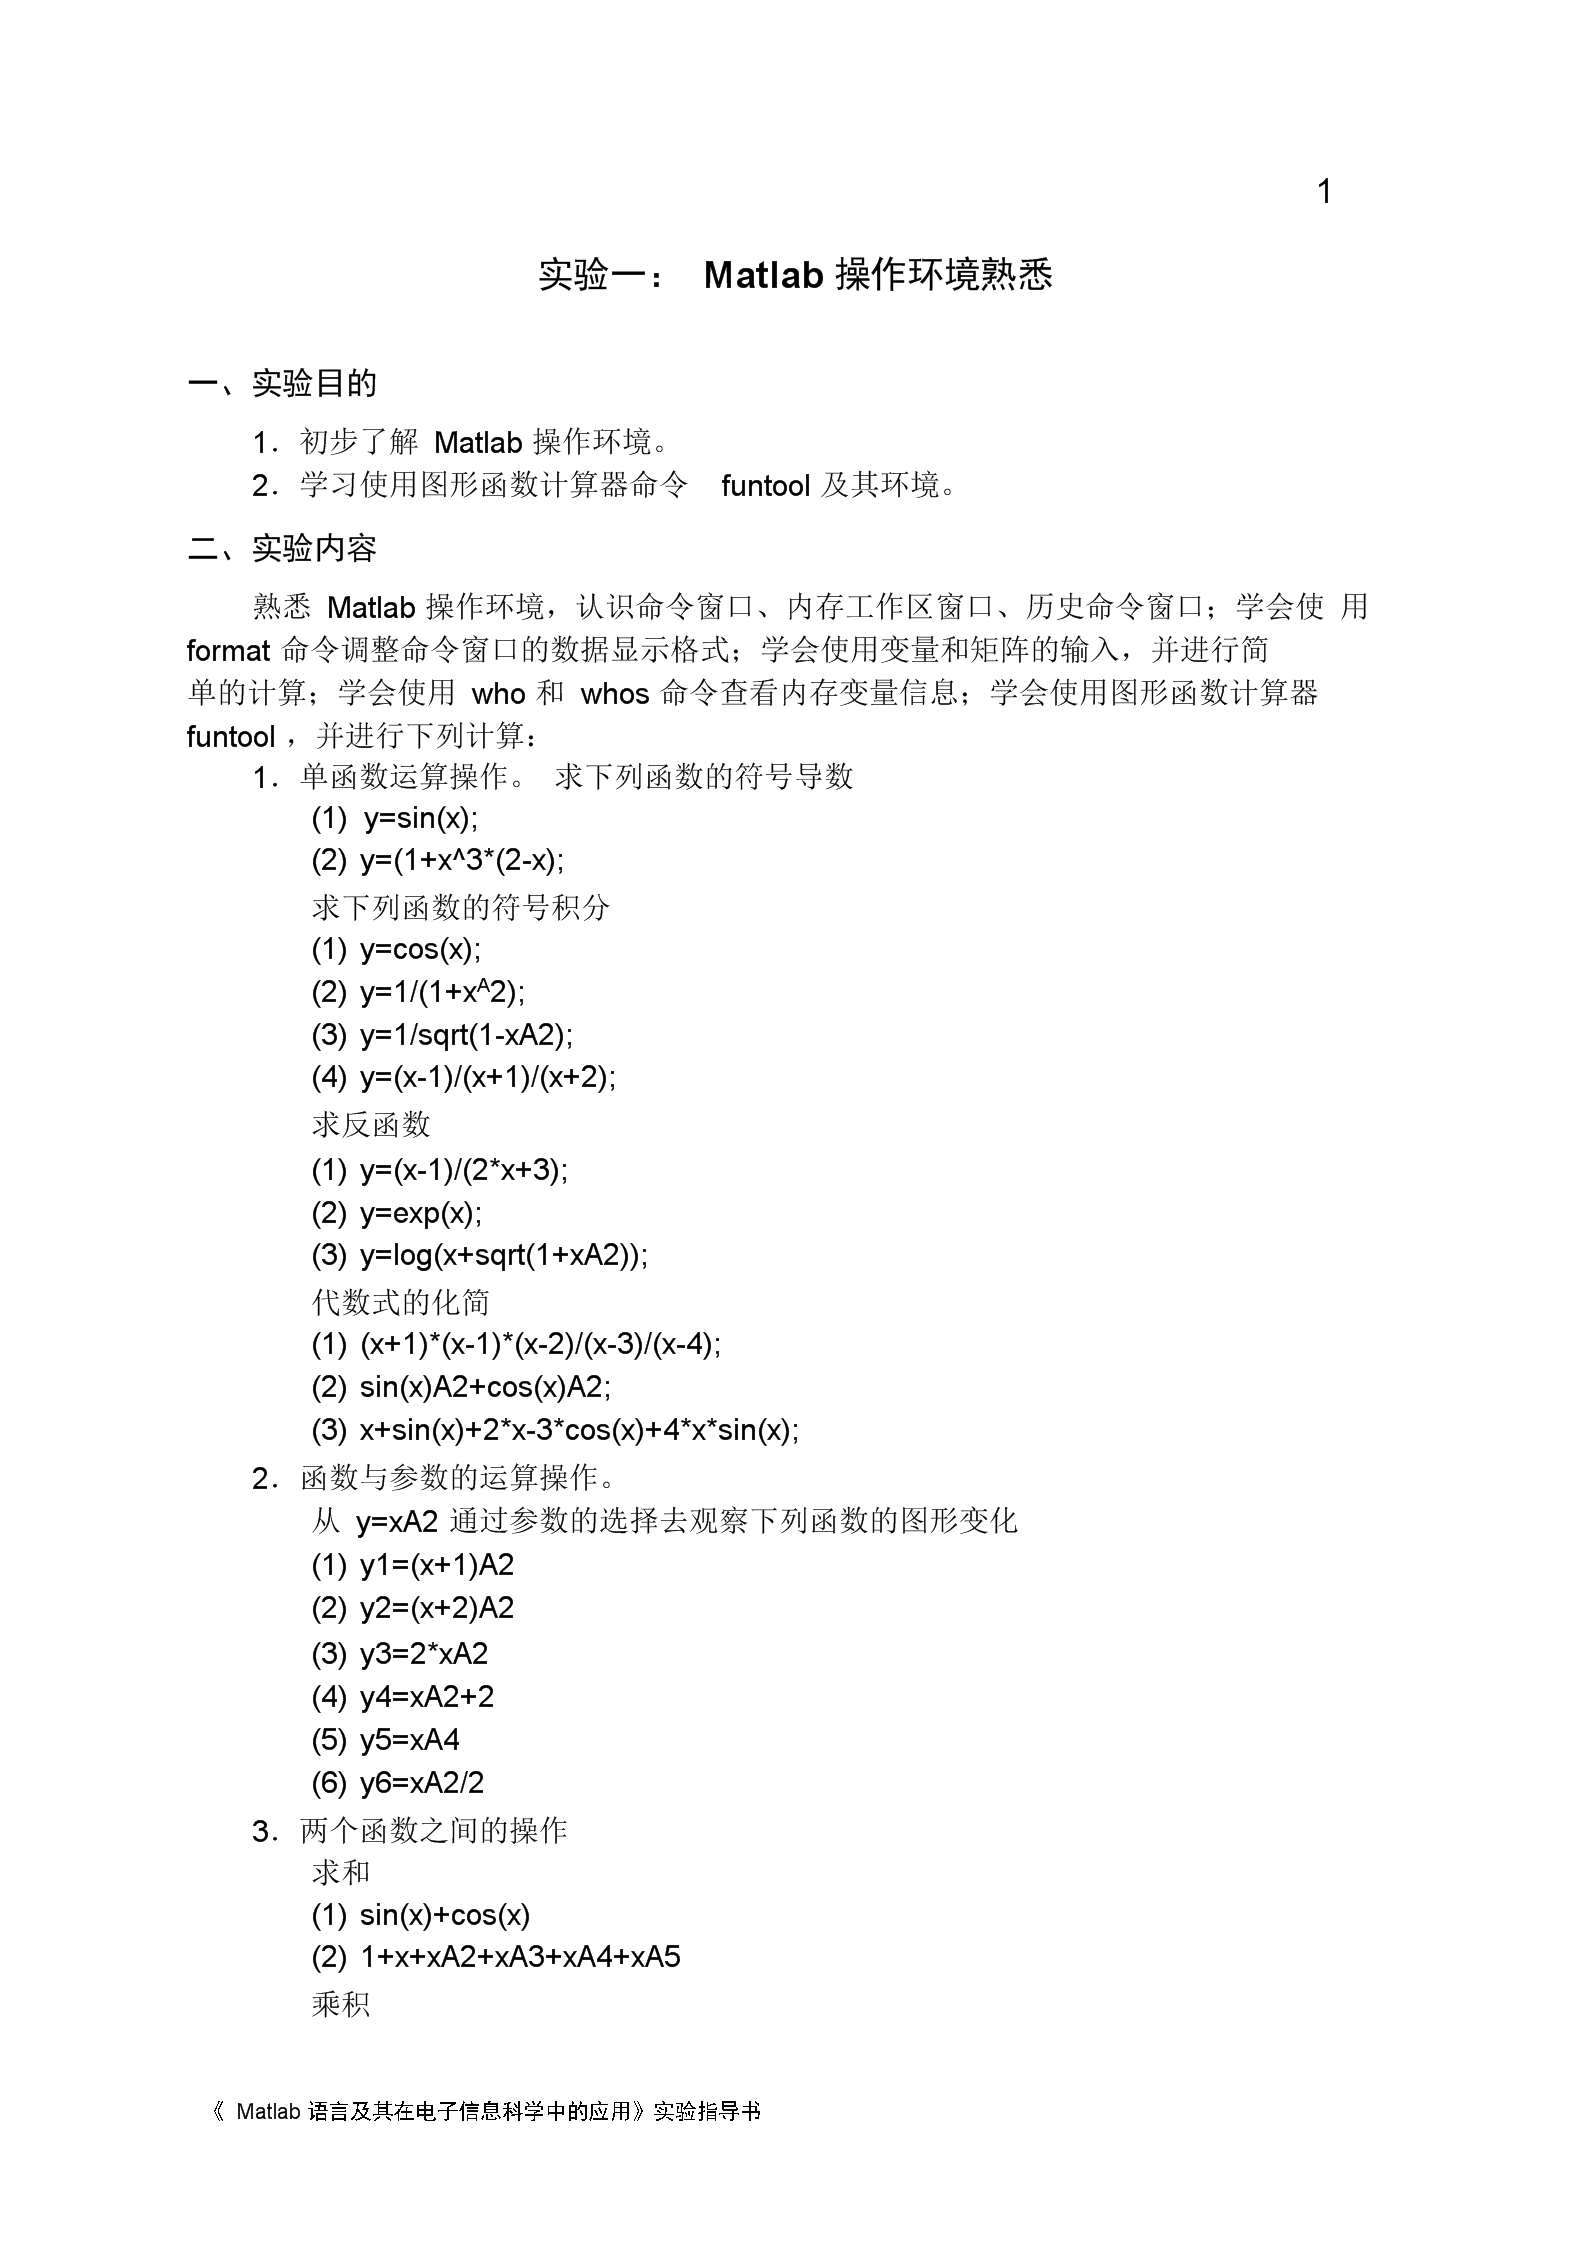 Matlab实验指导书(含答案)汇总.docx